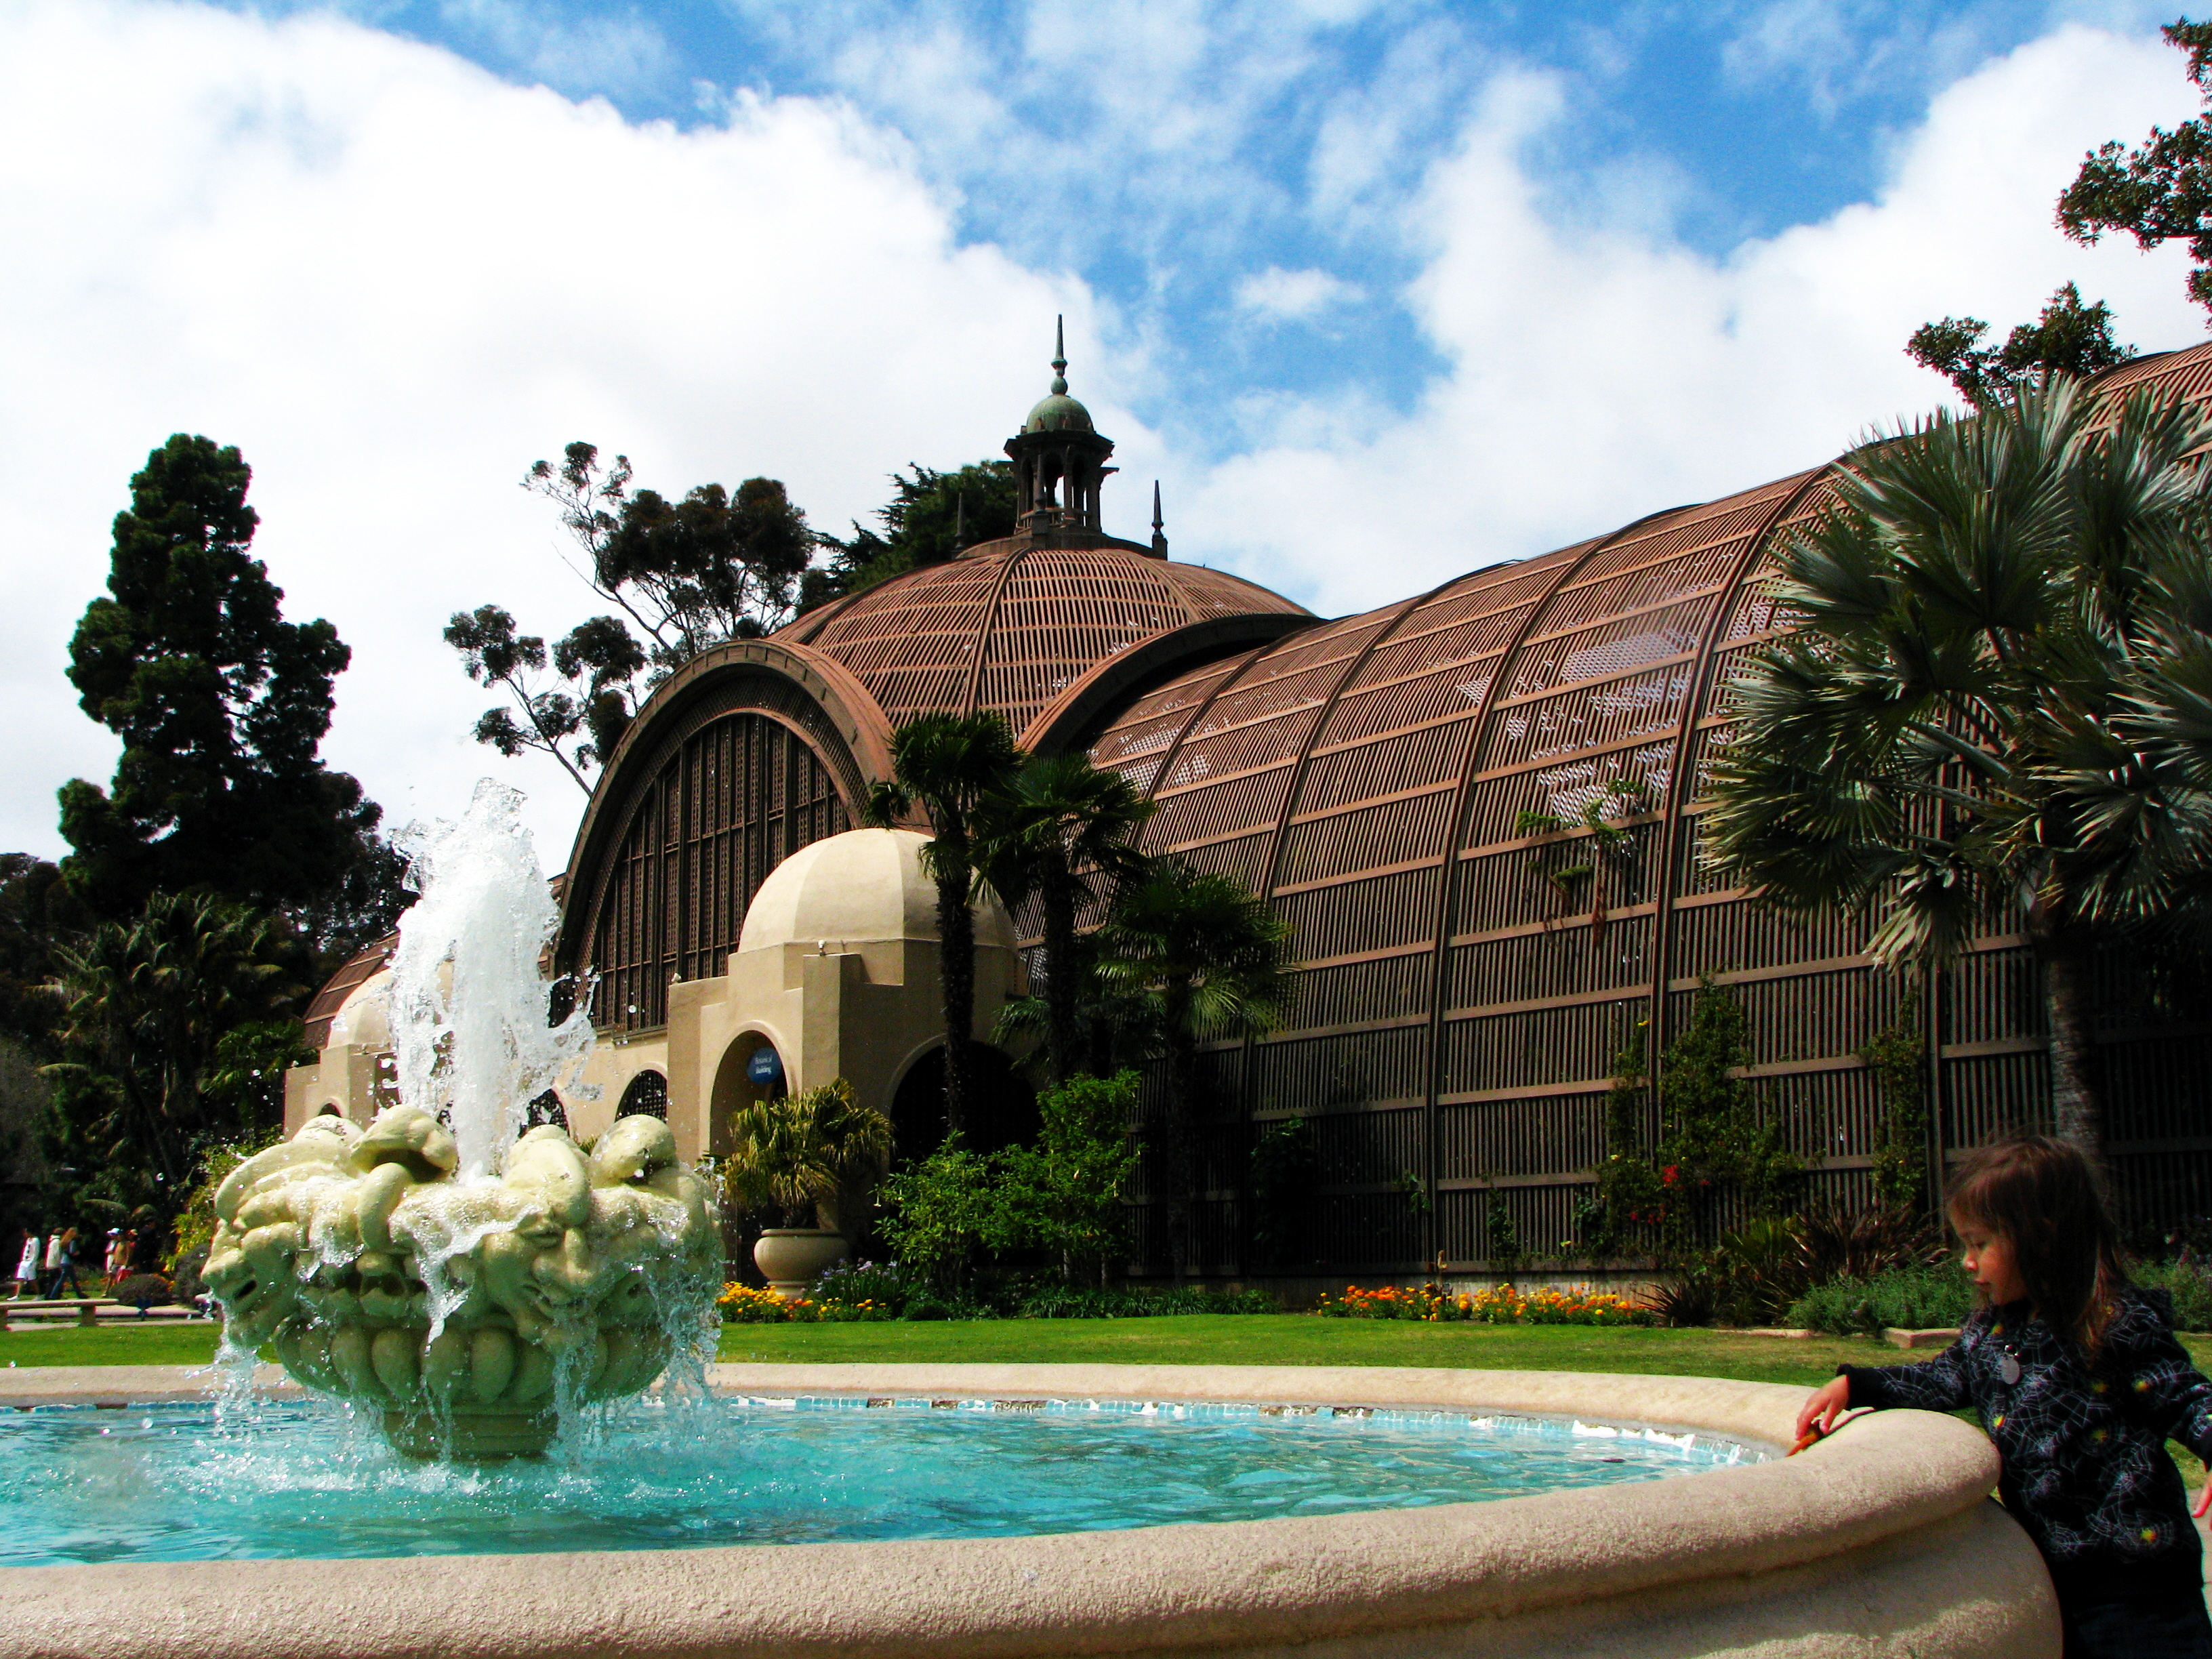 Wonderful File:Botanical Garden, Balboa Park